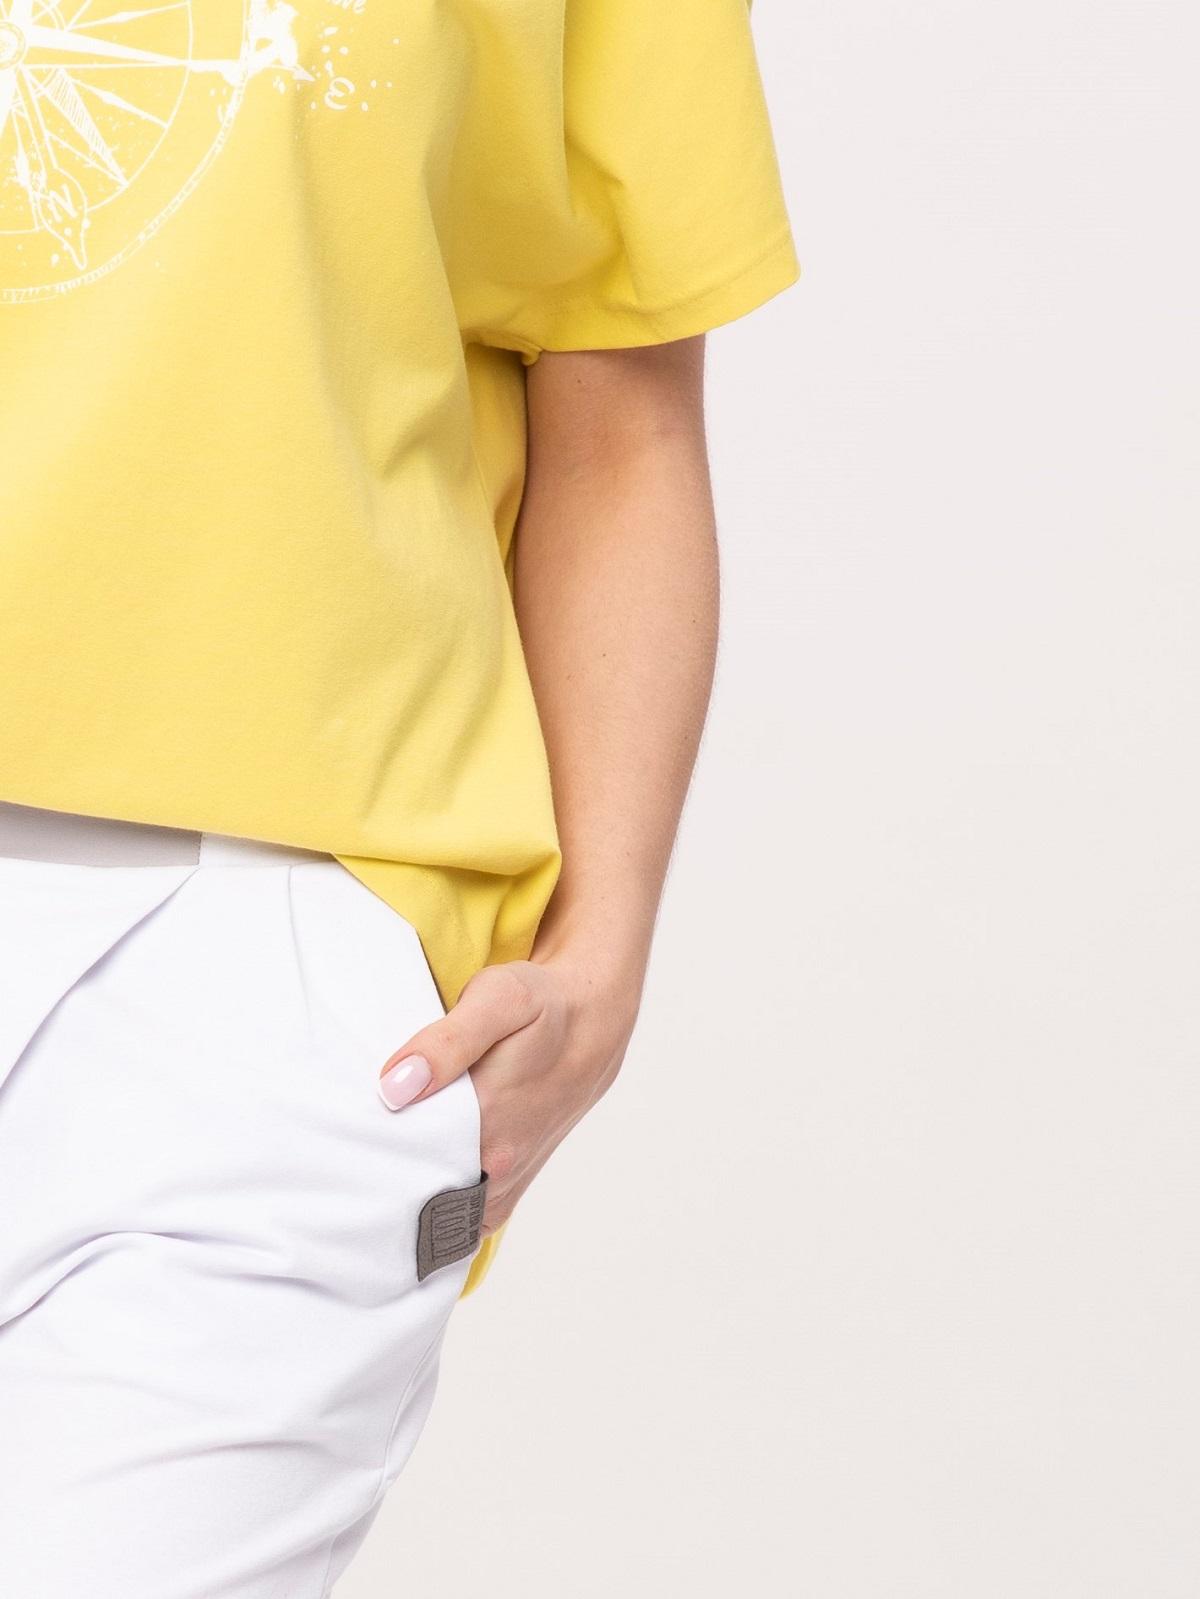 T-shirt z nadrukiem Inca Look 114 - LOOK made with Love   JestemSlow.pl